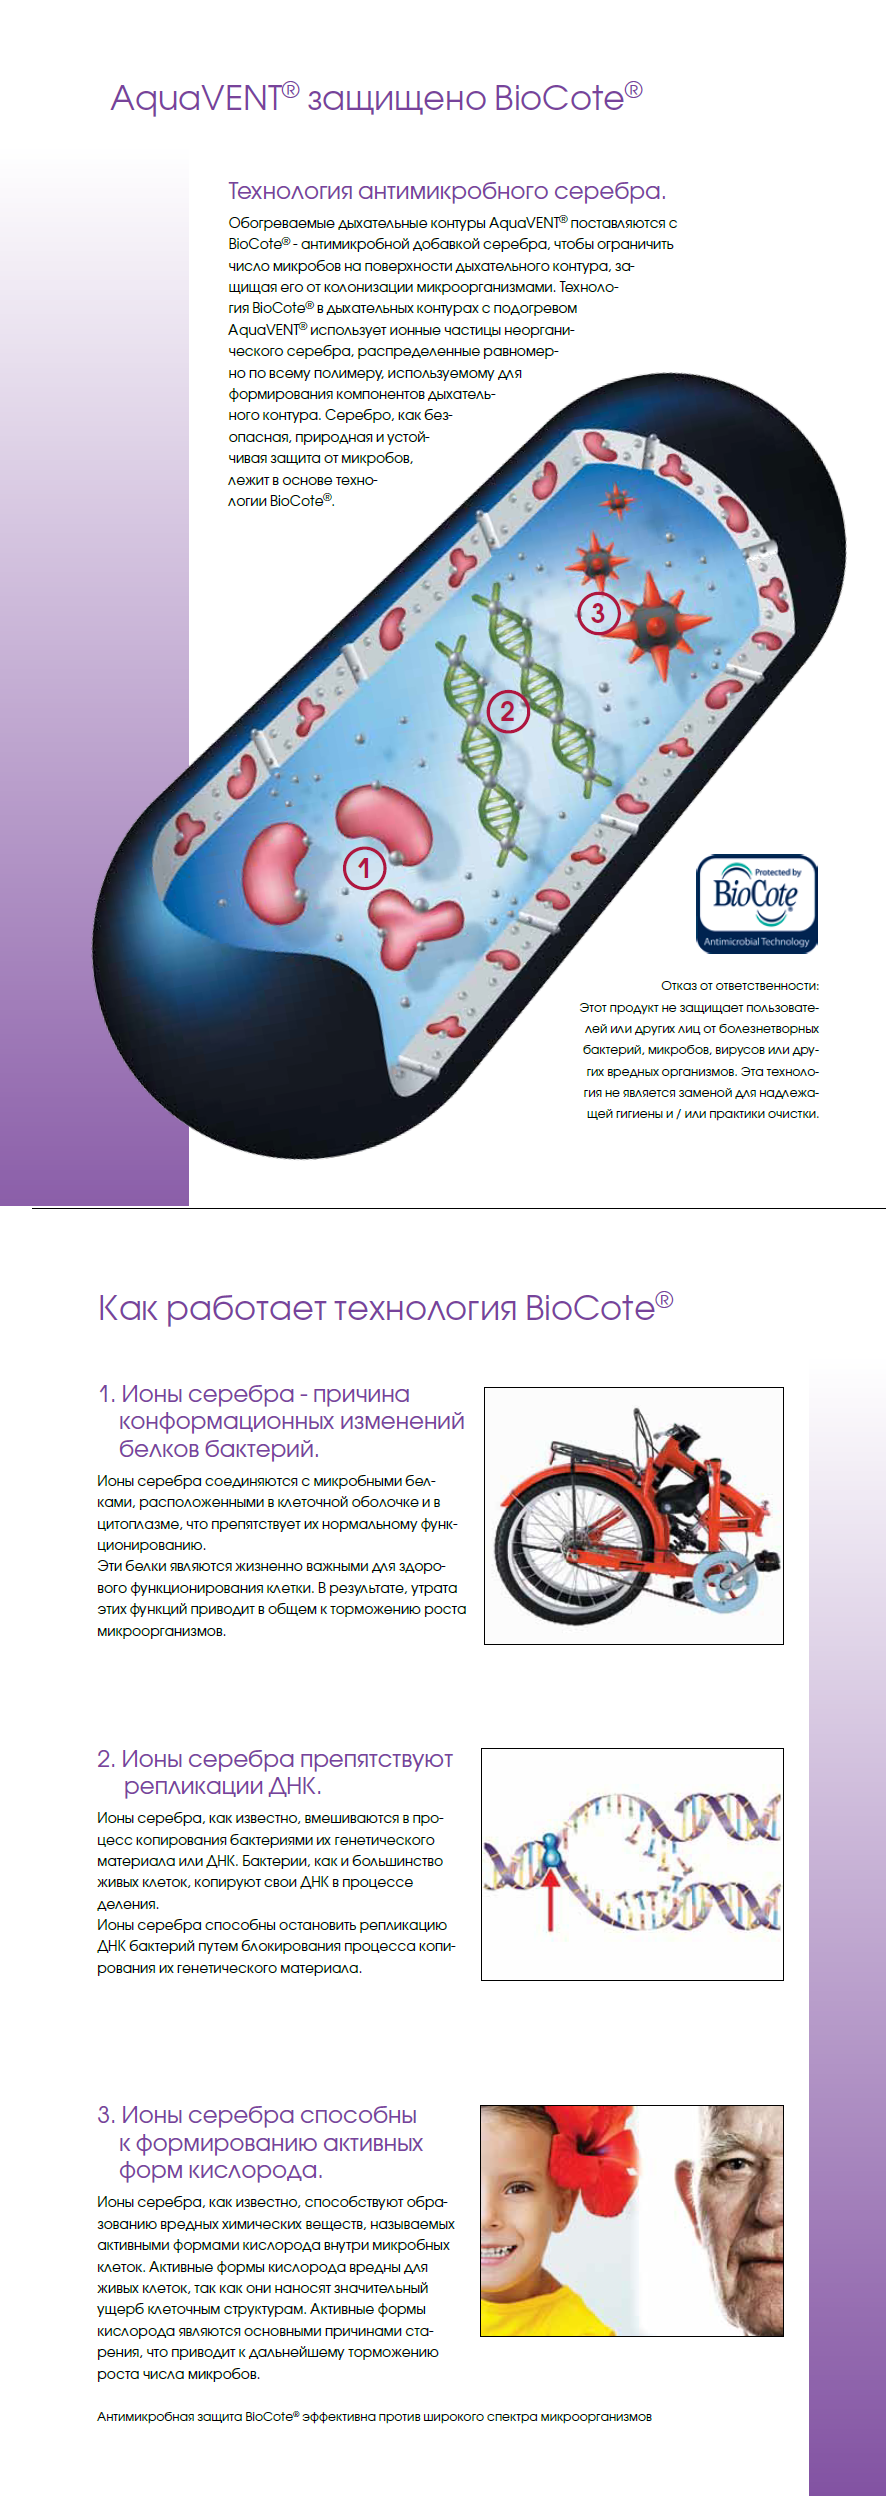 BioCote.png (1.15 MB)